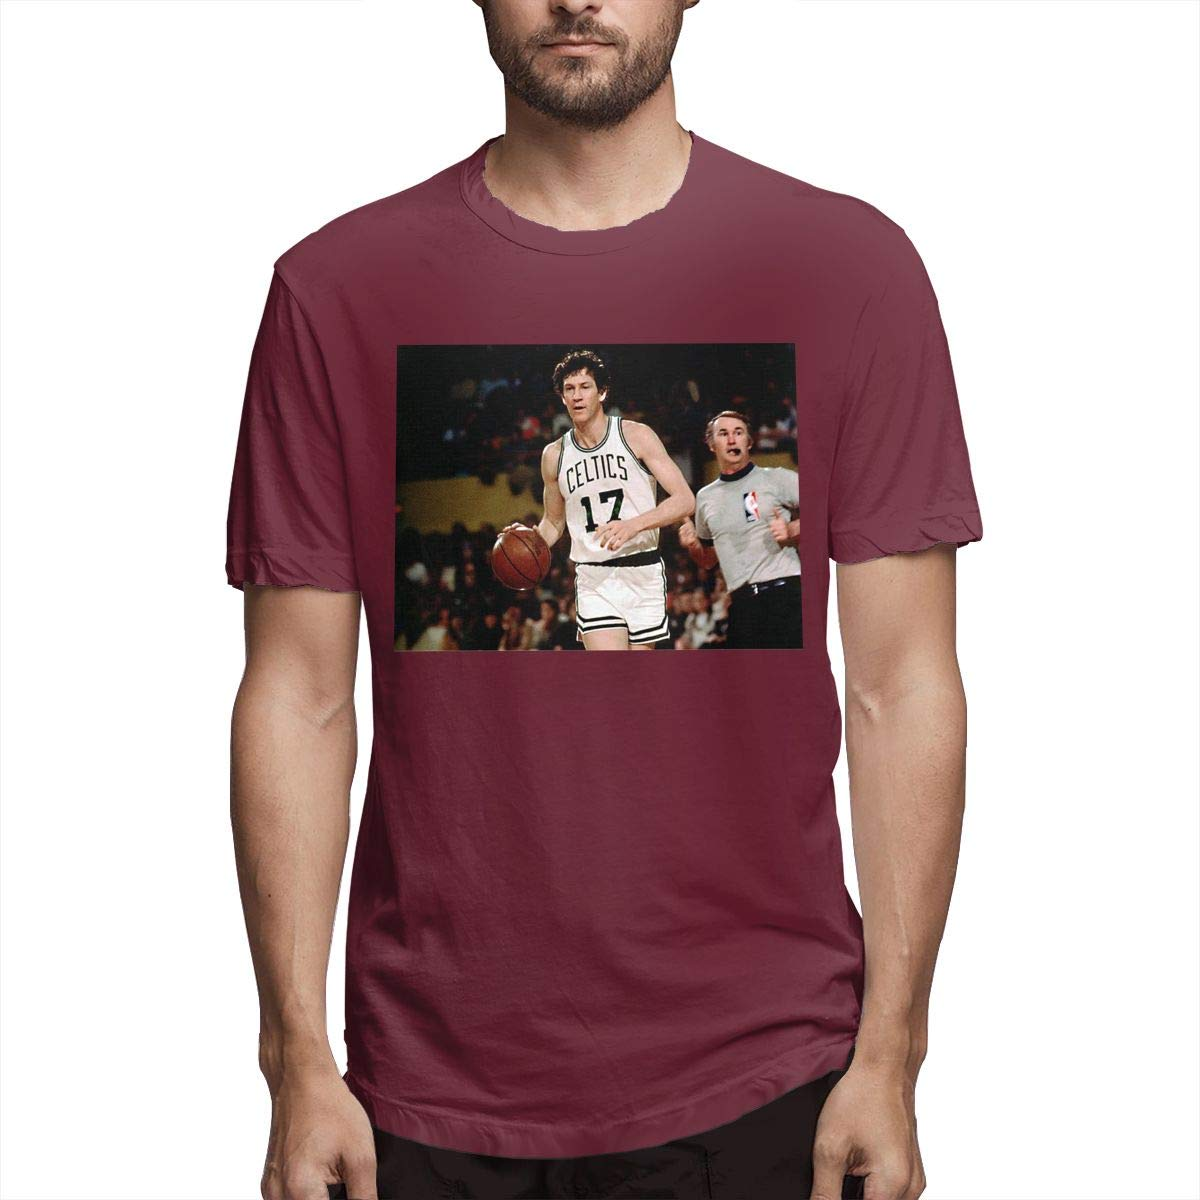 S Vlicek Poster Short Sleeve Classic Comfort Soft Crewneck Tshirt